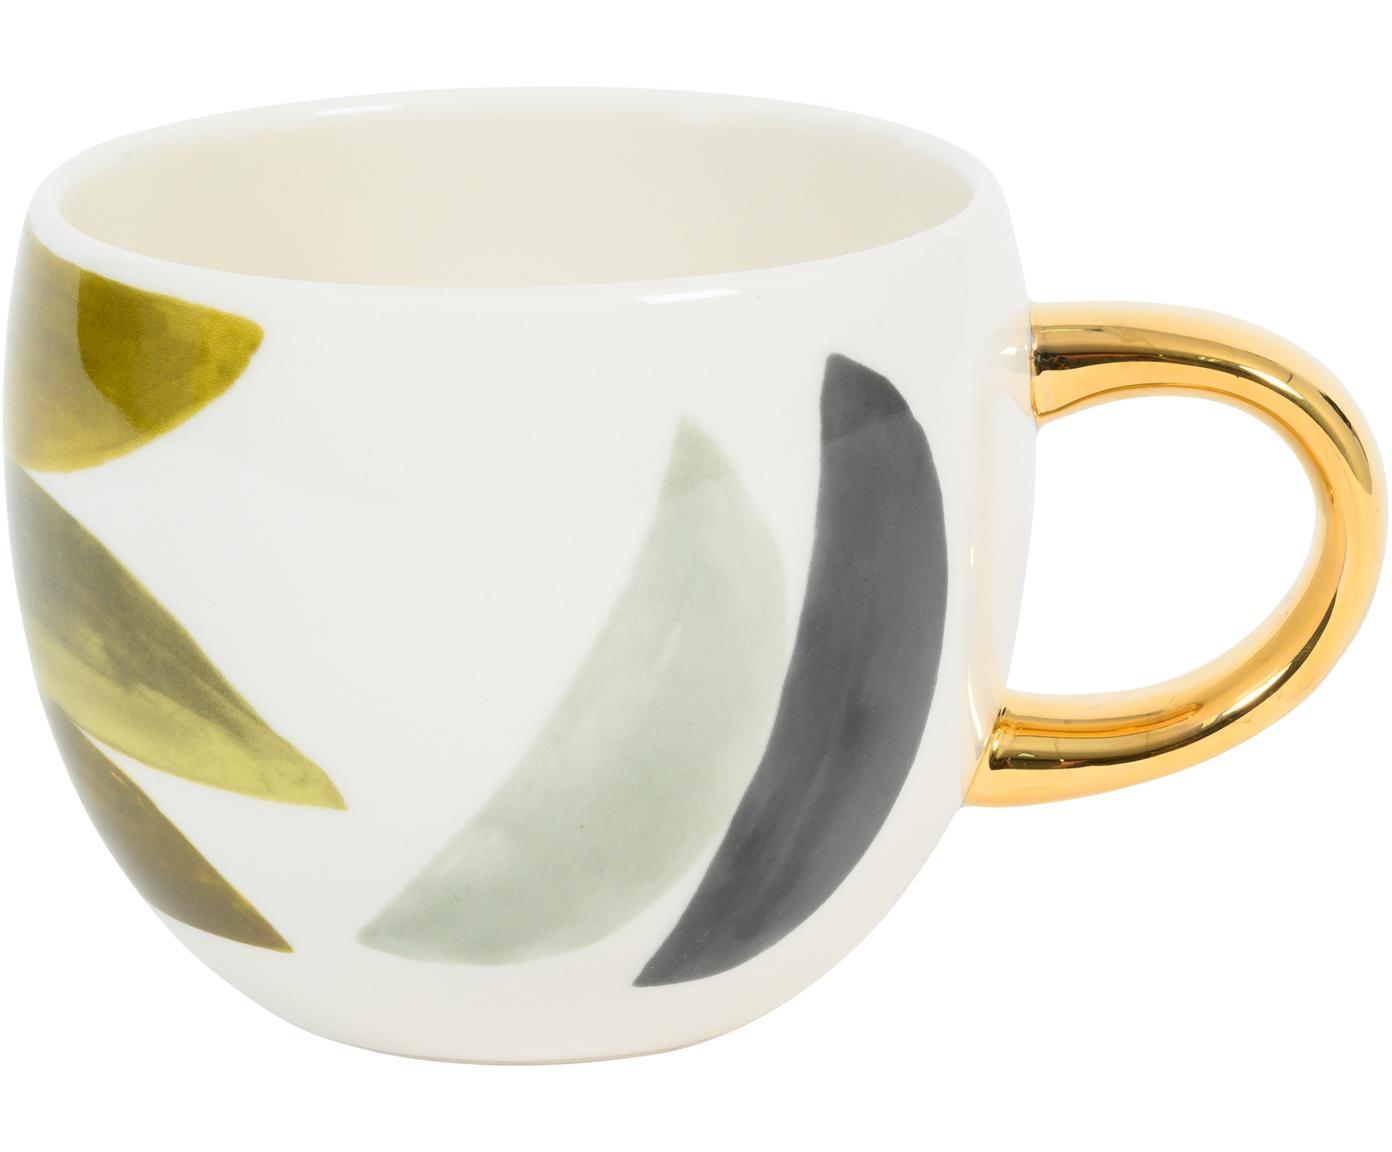 Koffiekopje Boomerang met goudkleurig handvat, Keramiek, Multicolour, Ø 11 cm